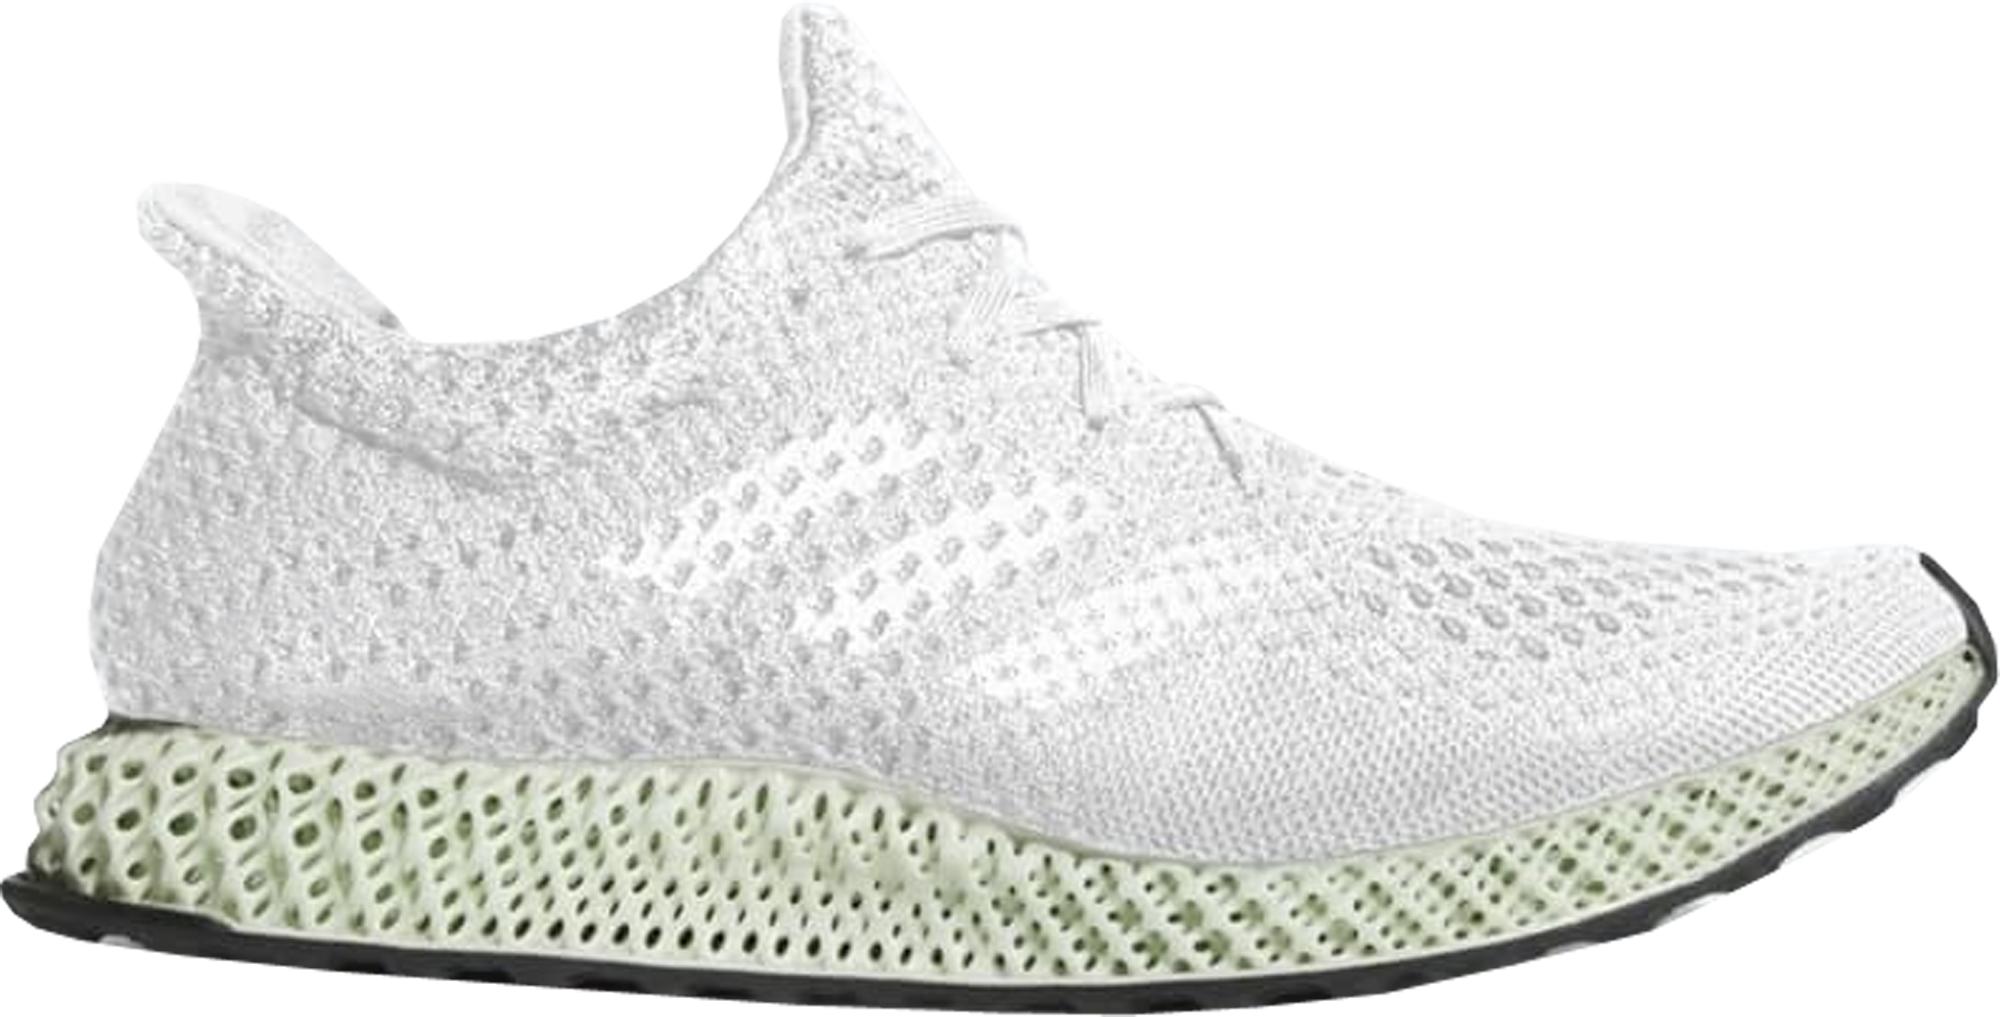 Adidas futurecraft 4D blanco Ash verde bd7701